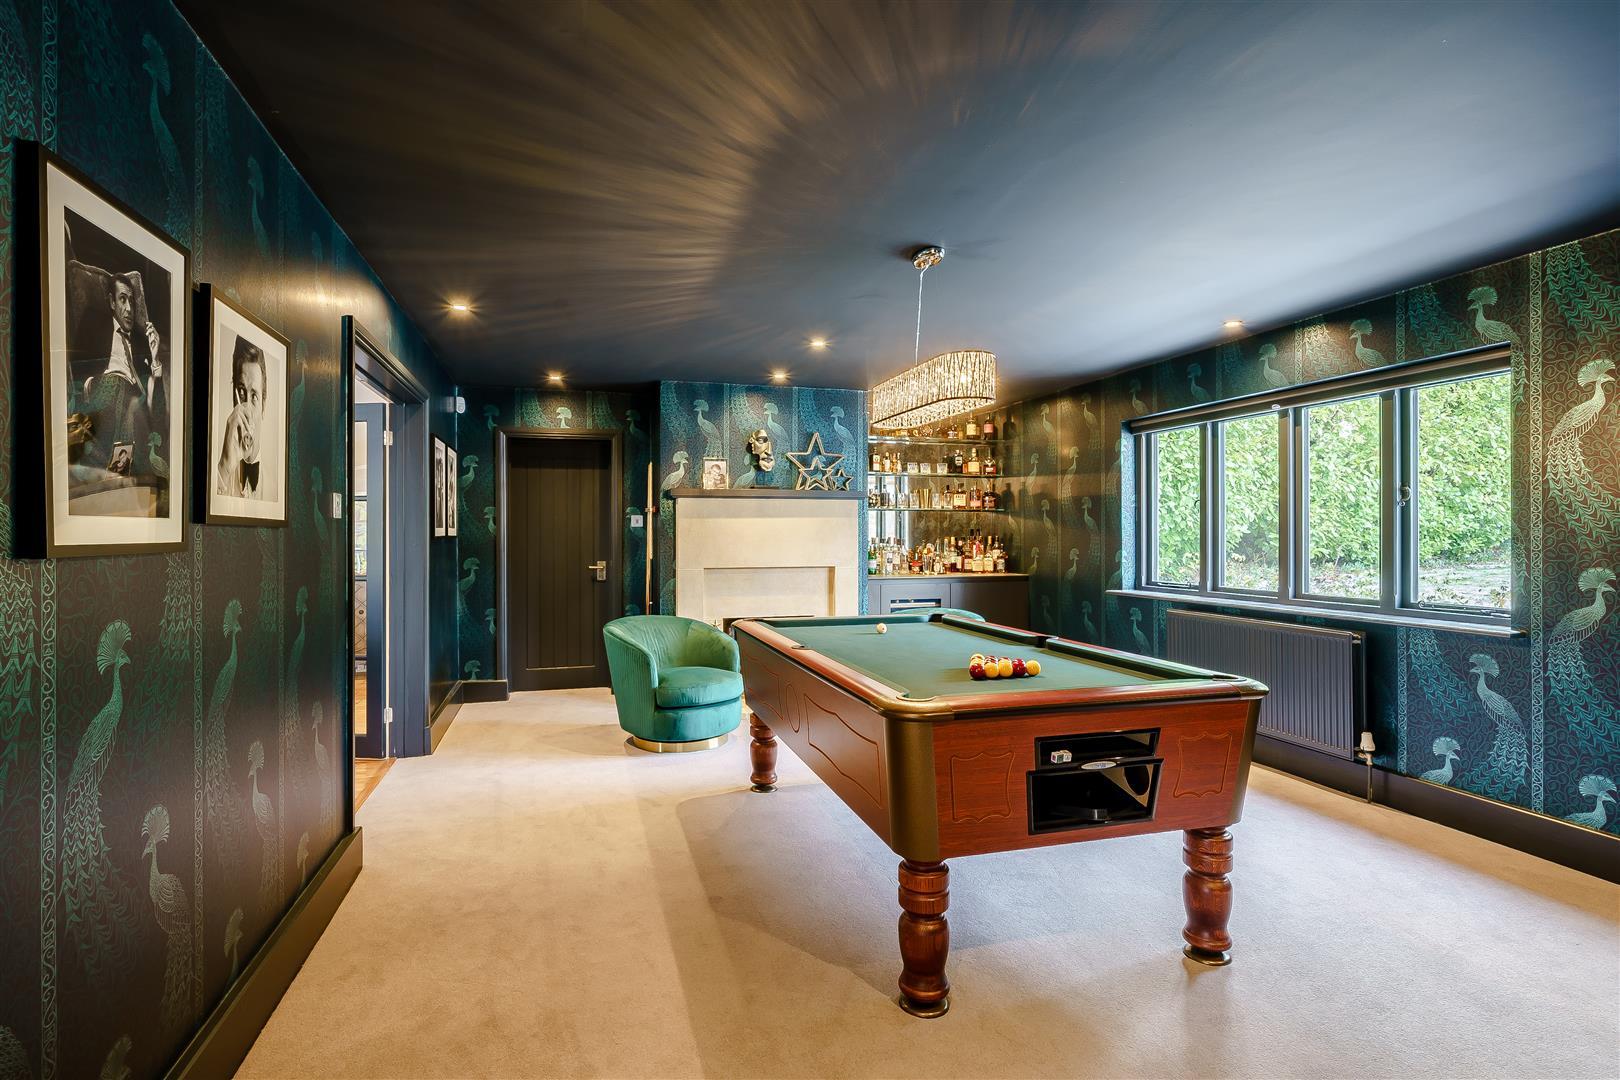 Rowstock Manor - Gallery Image 23 - Games / Bar Room